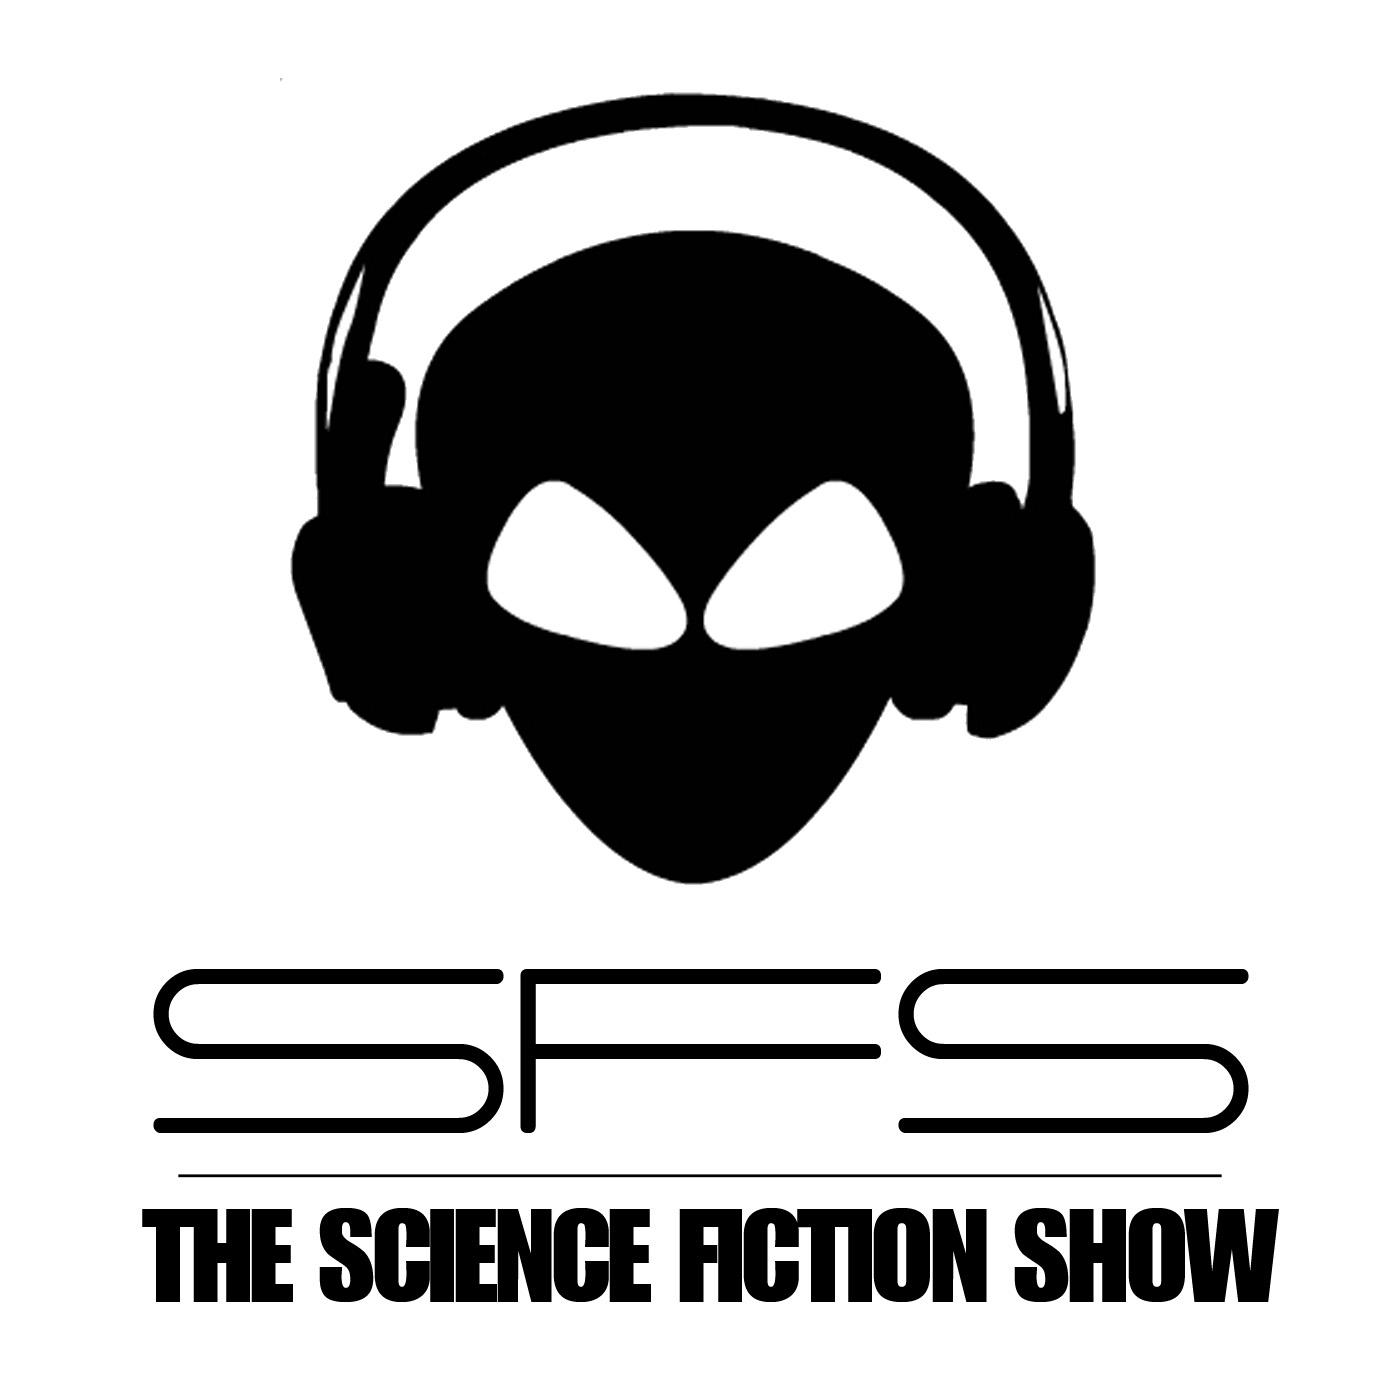 Episode 72: Winter Soldier, Star Wars & Almost Human